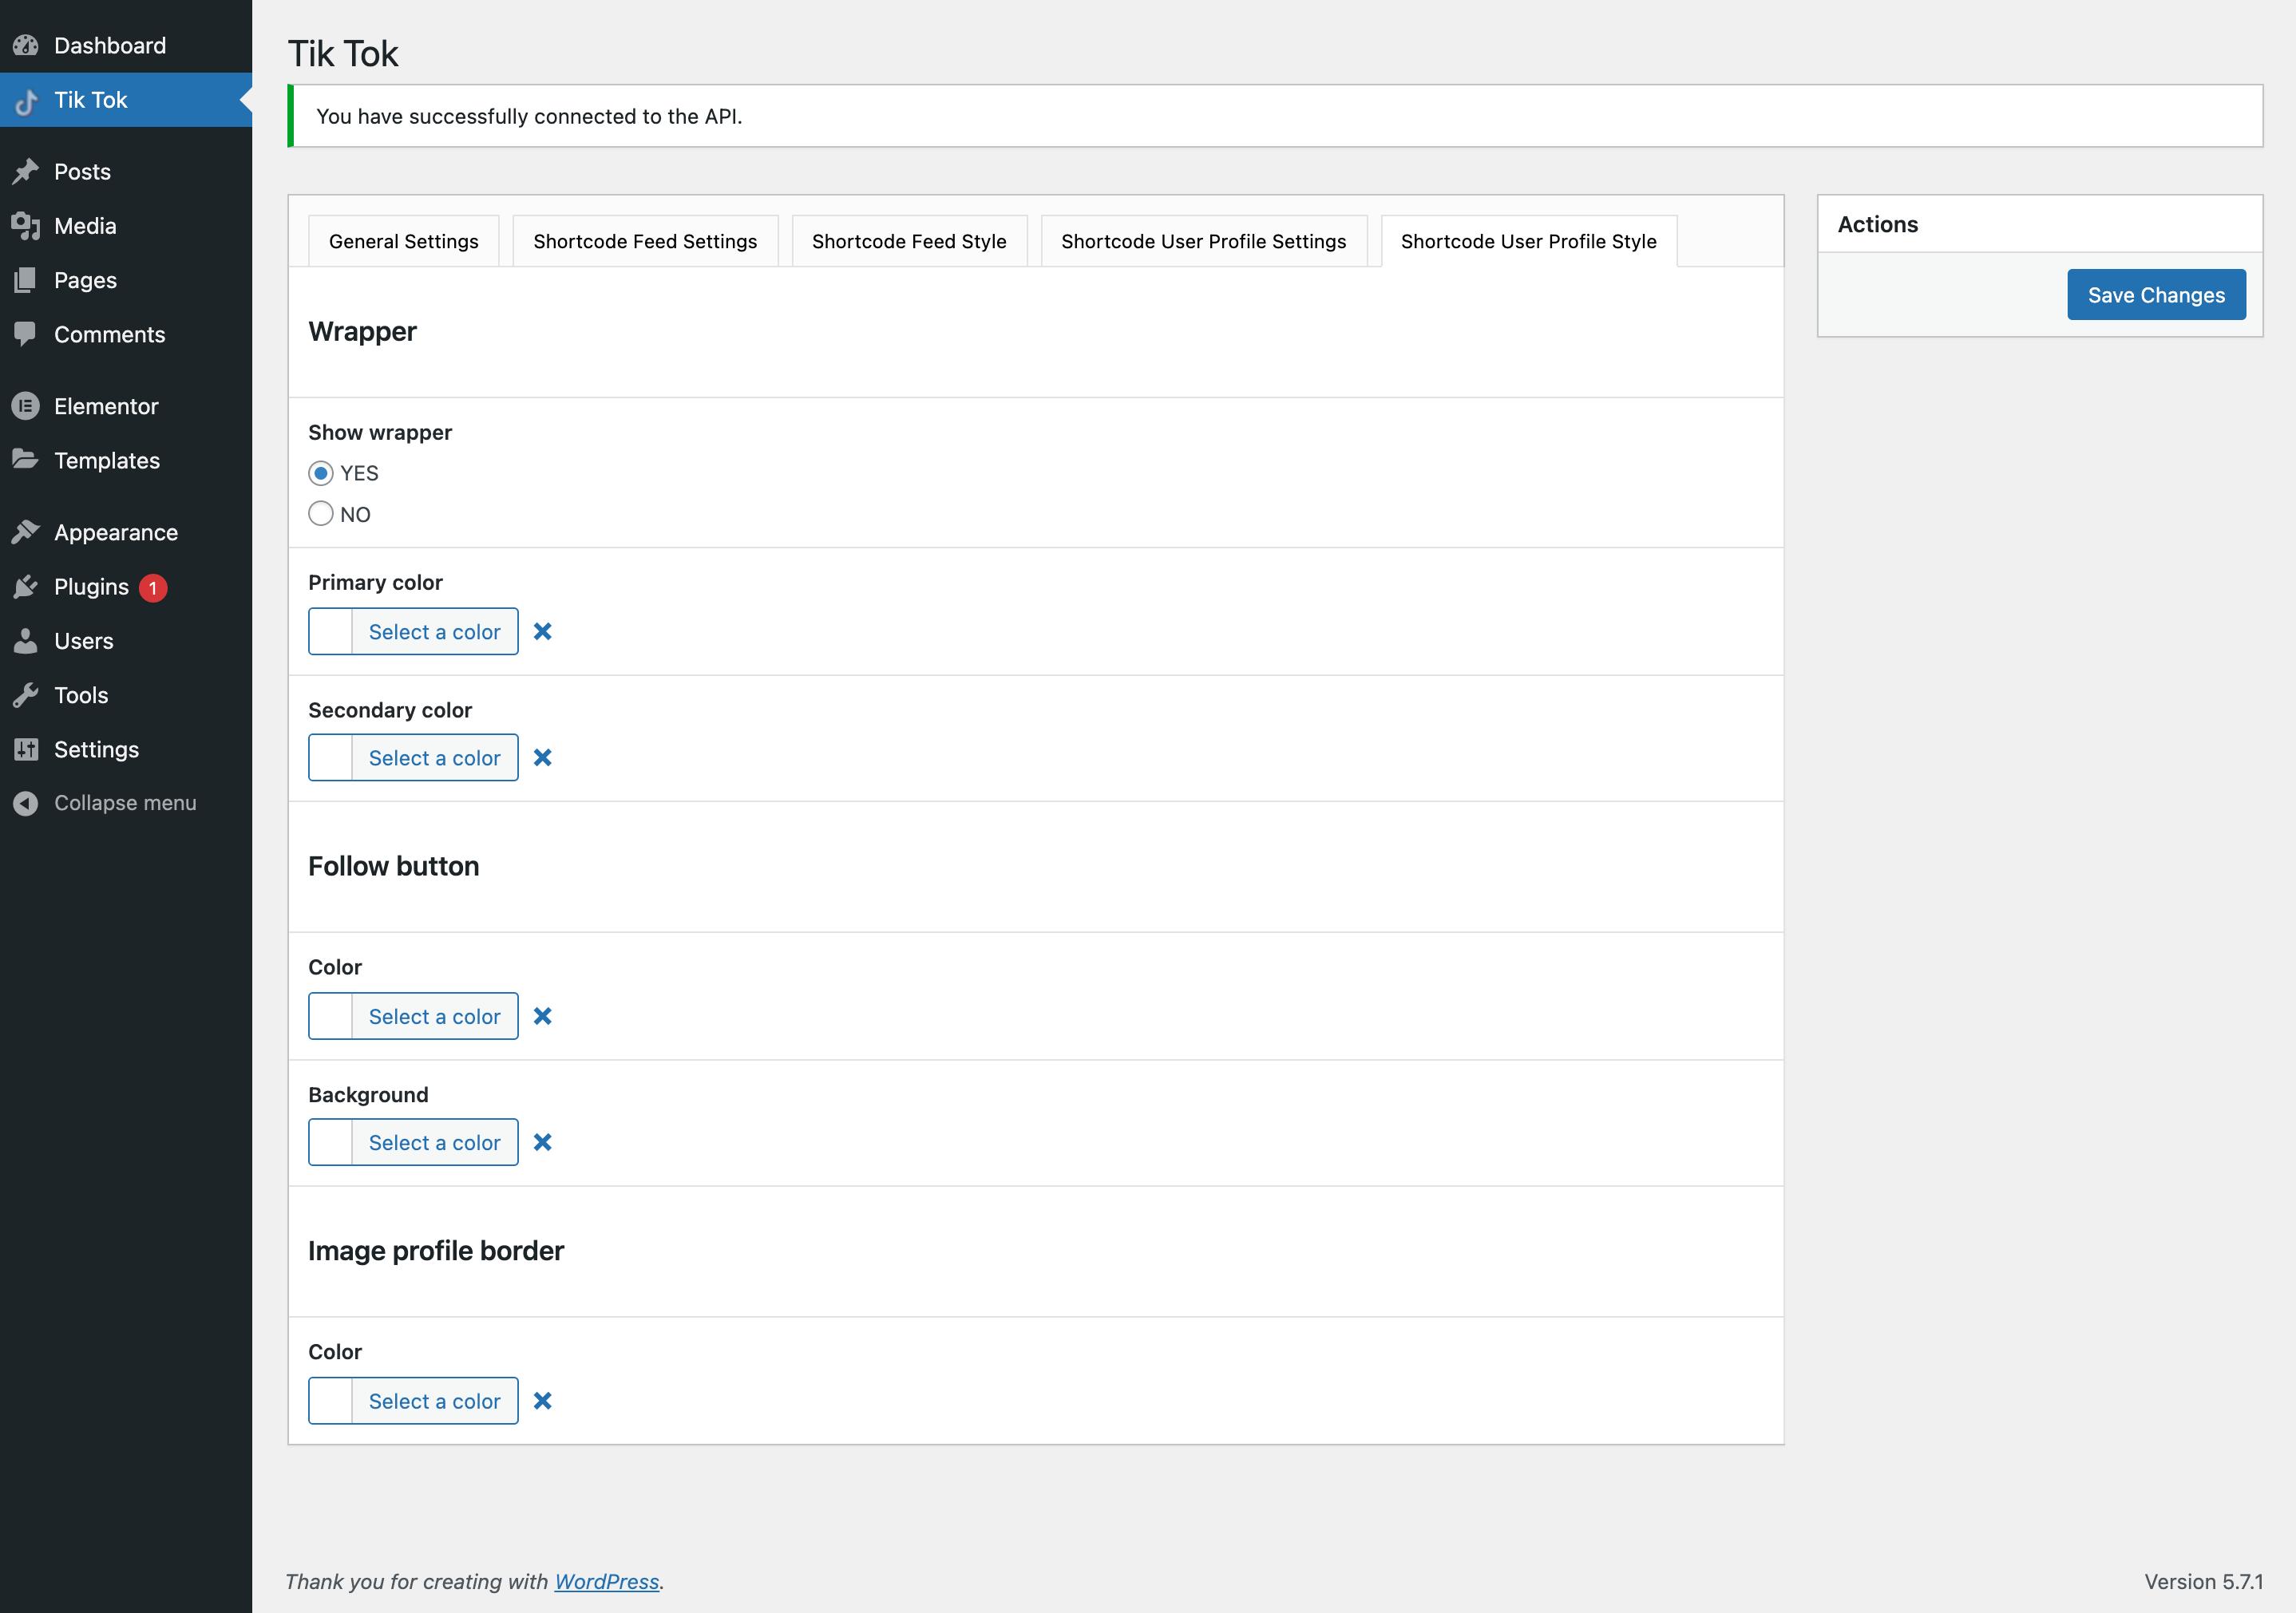 Tik Tok Feed / Shortcode user profile style